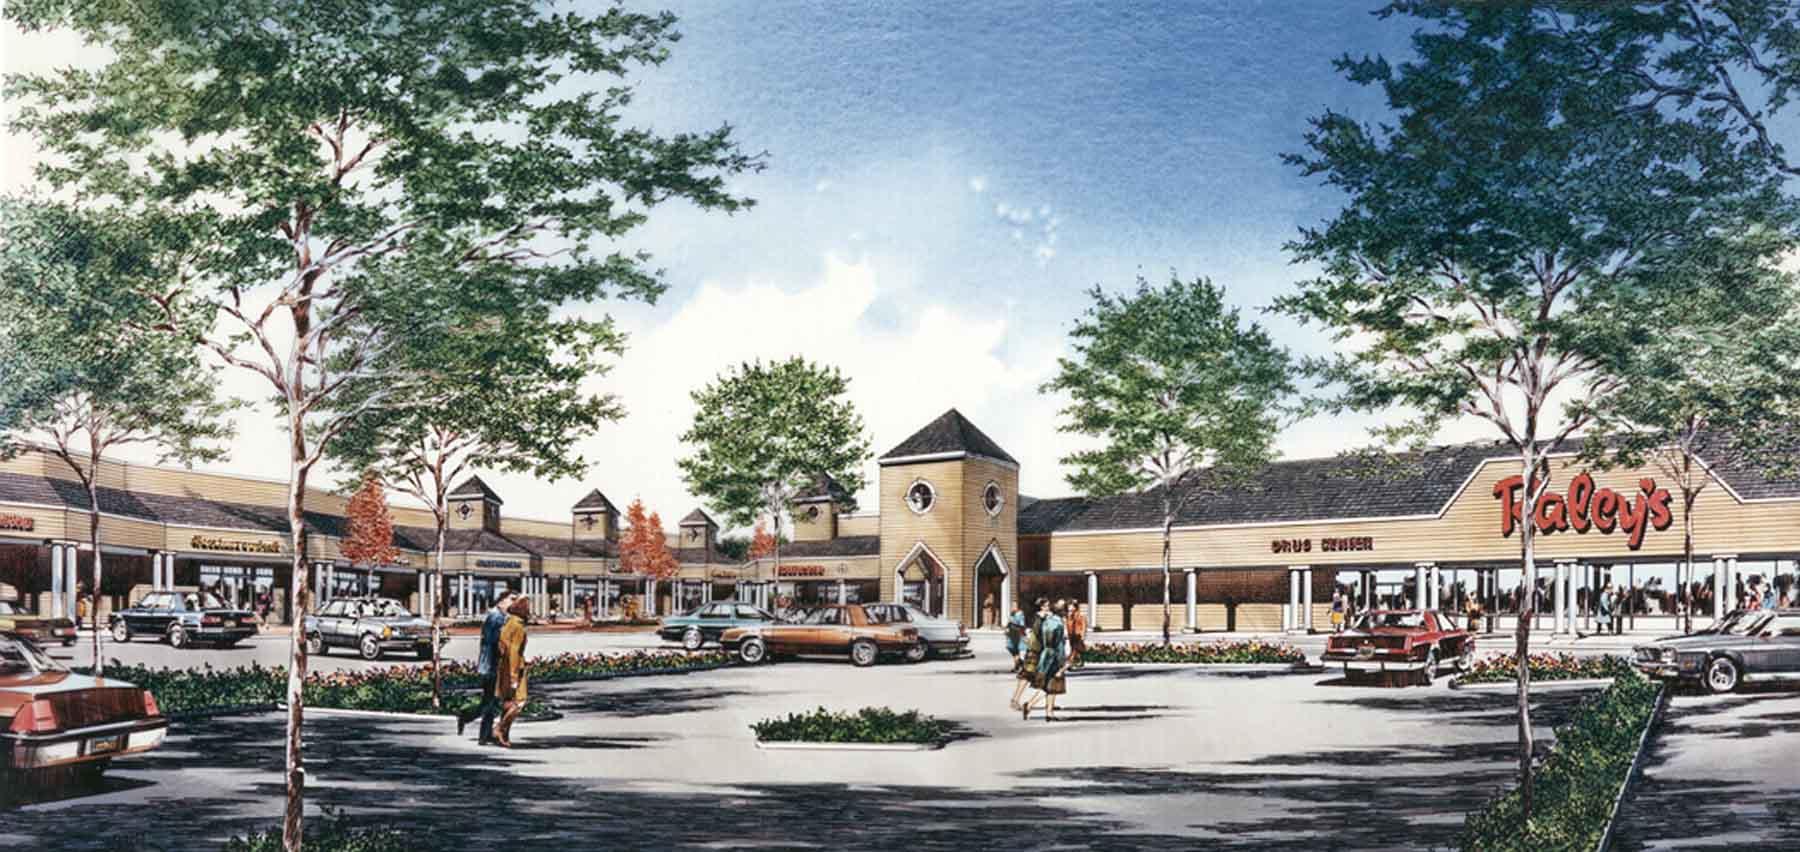 Heritage Park Retail Shopping Center Suisun City